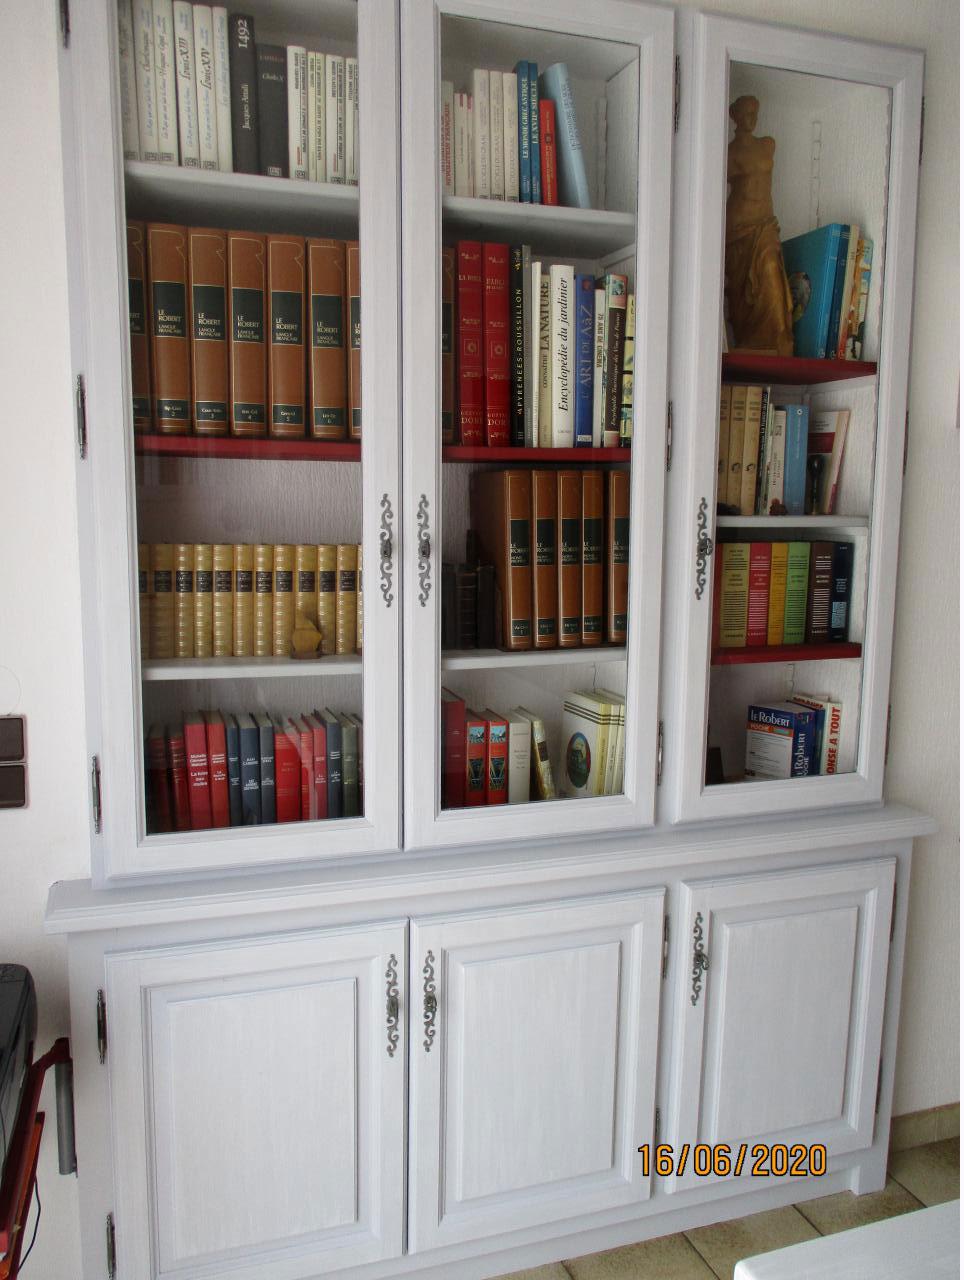 restauration de bibliothèque-perpignan